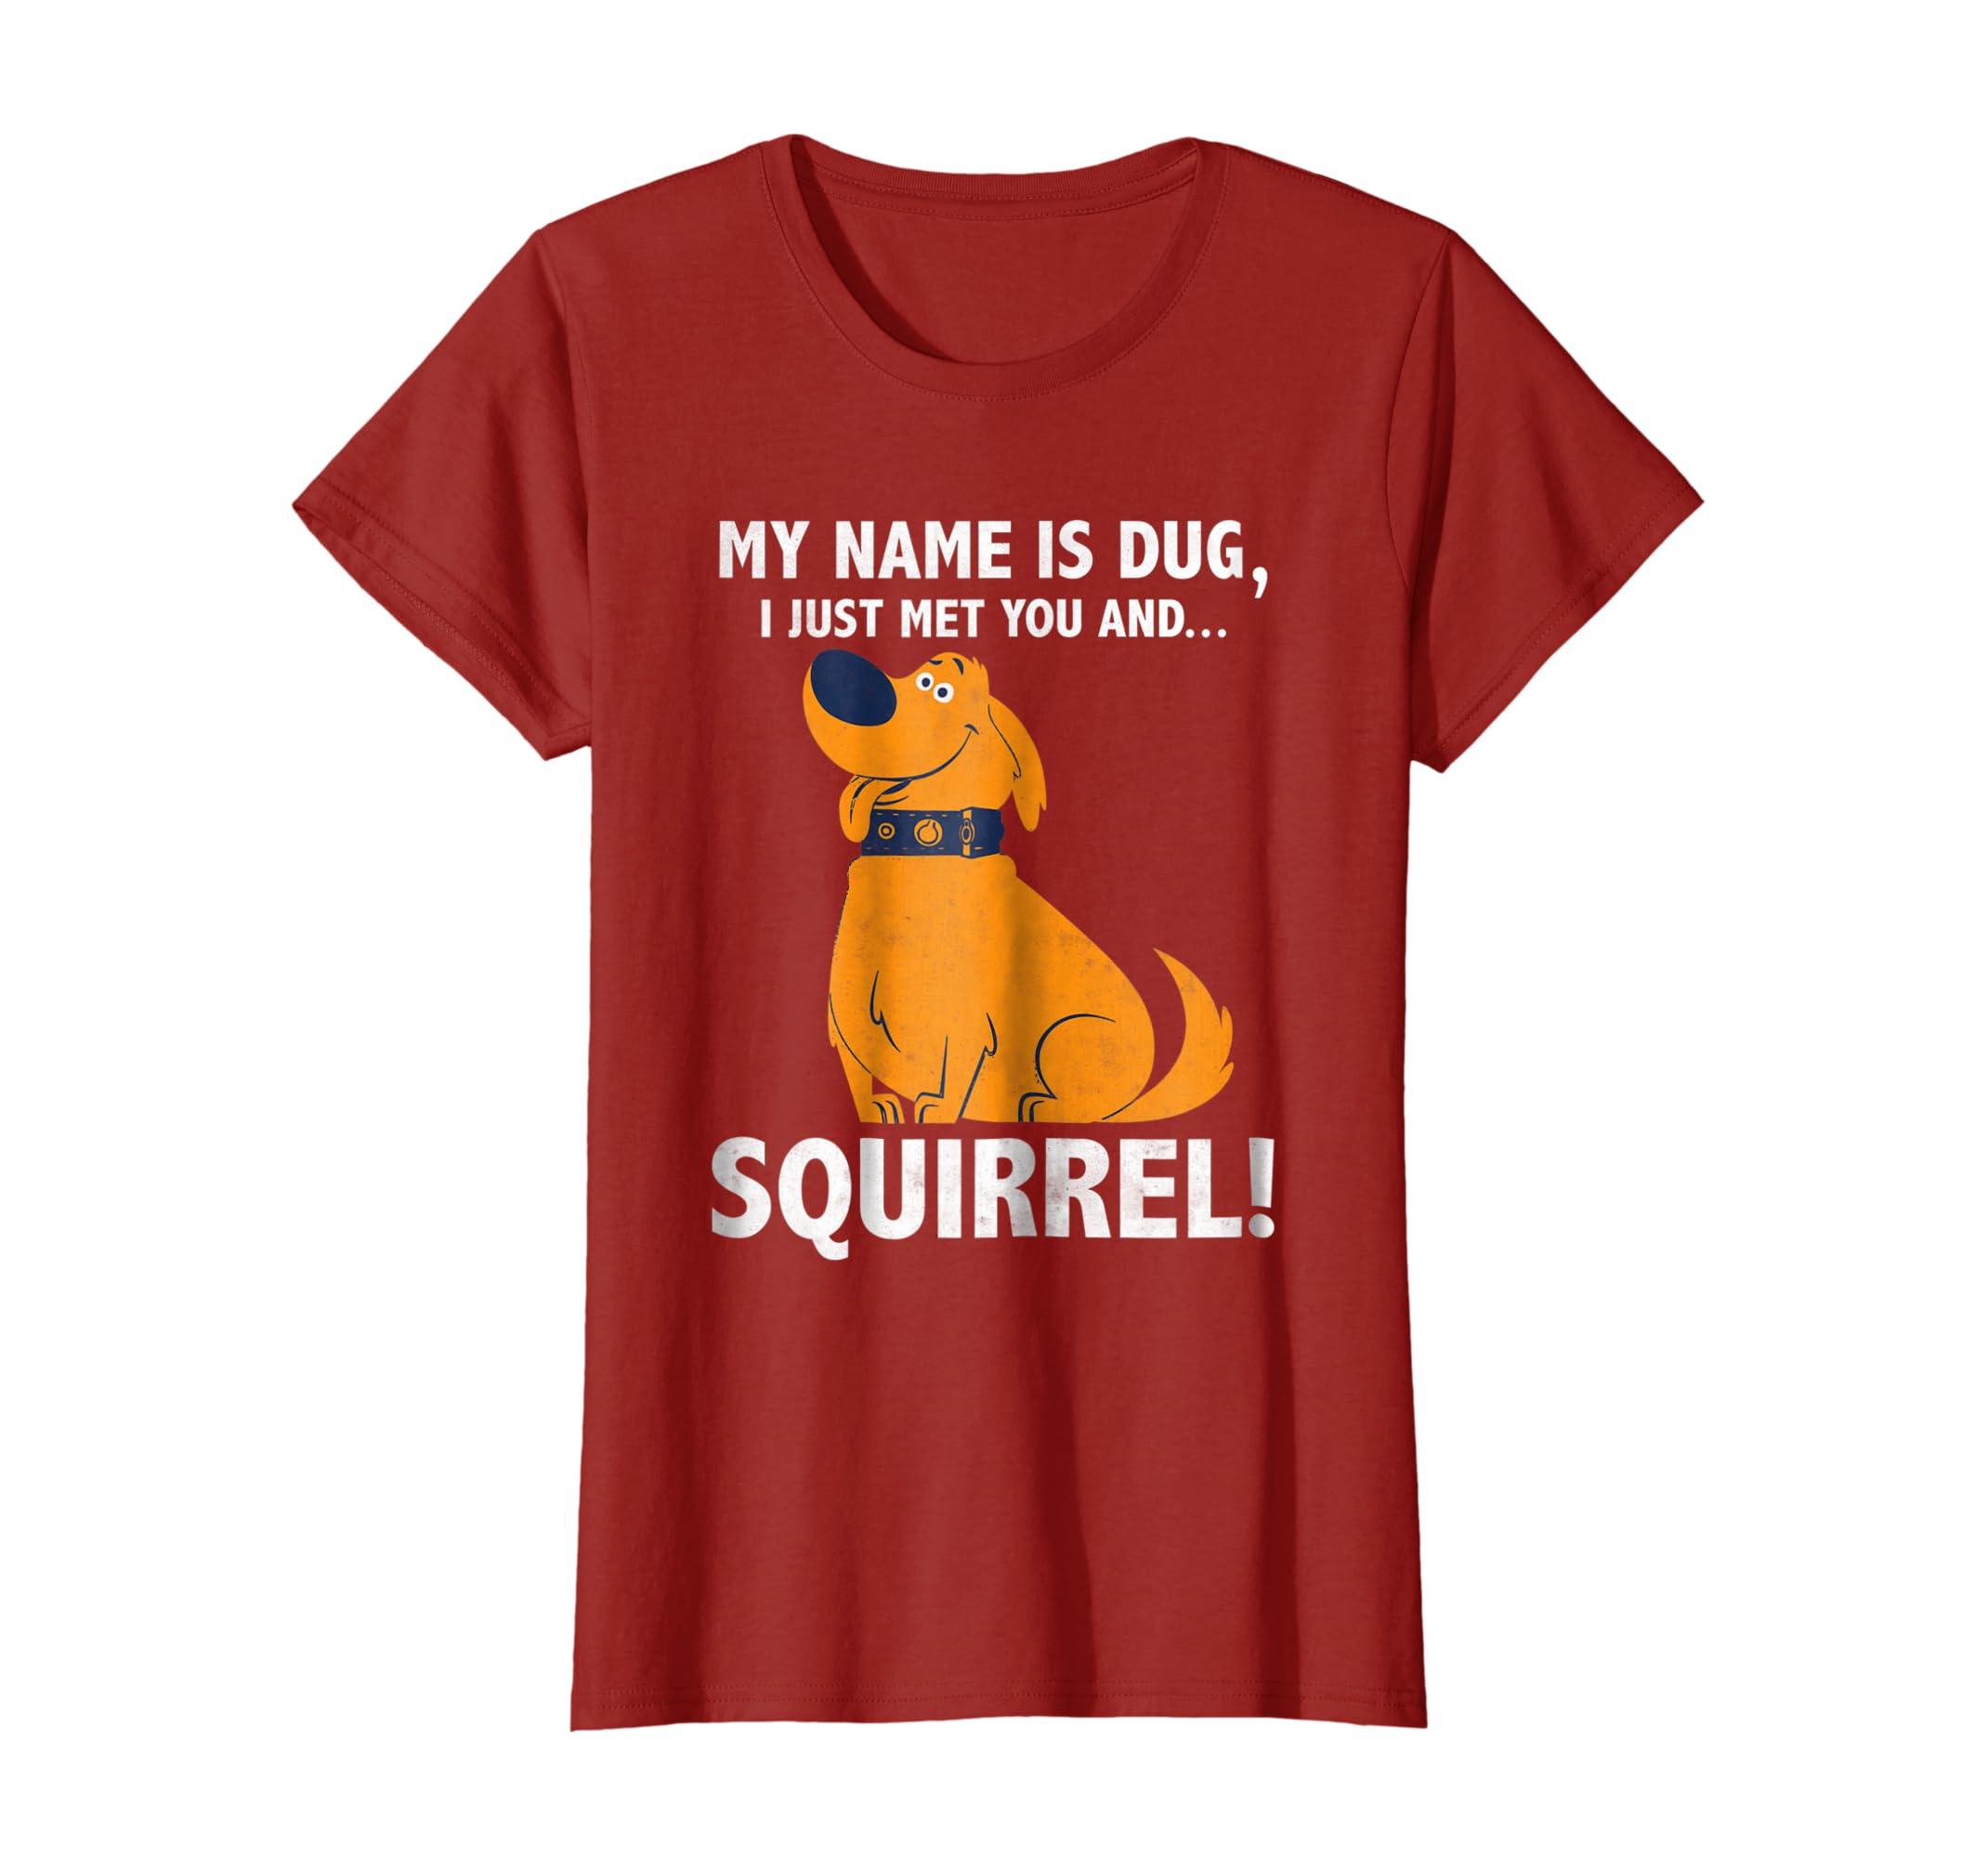 1b9919cb Amazon.com: Disney Up My Name is Dug Squirrel Graphic T-Shirt: Clothing